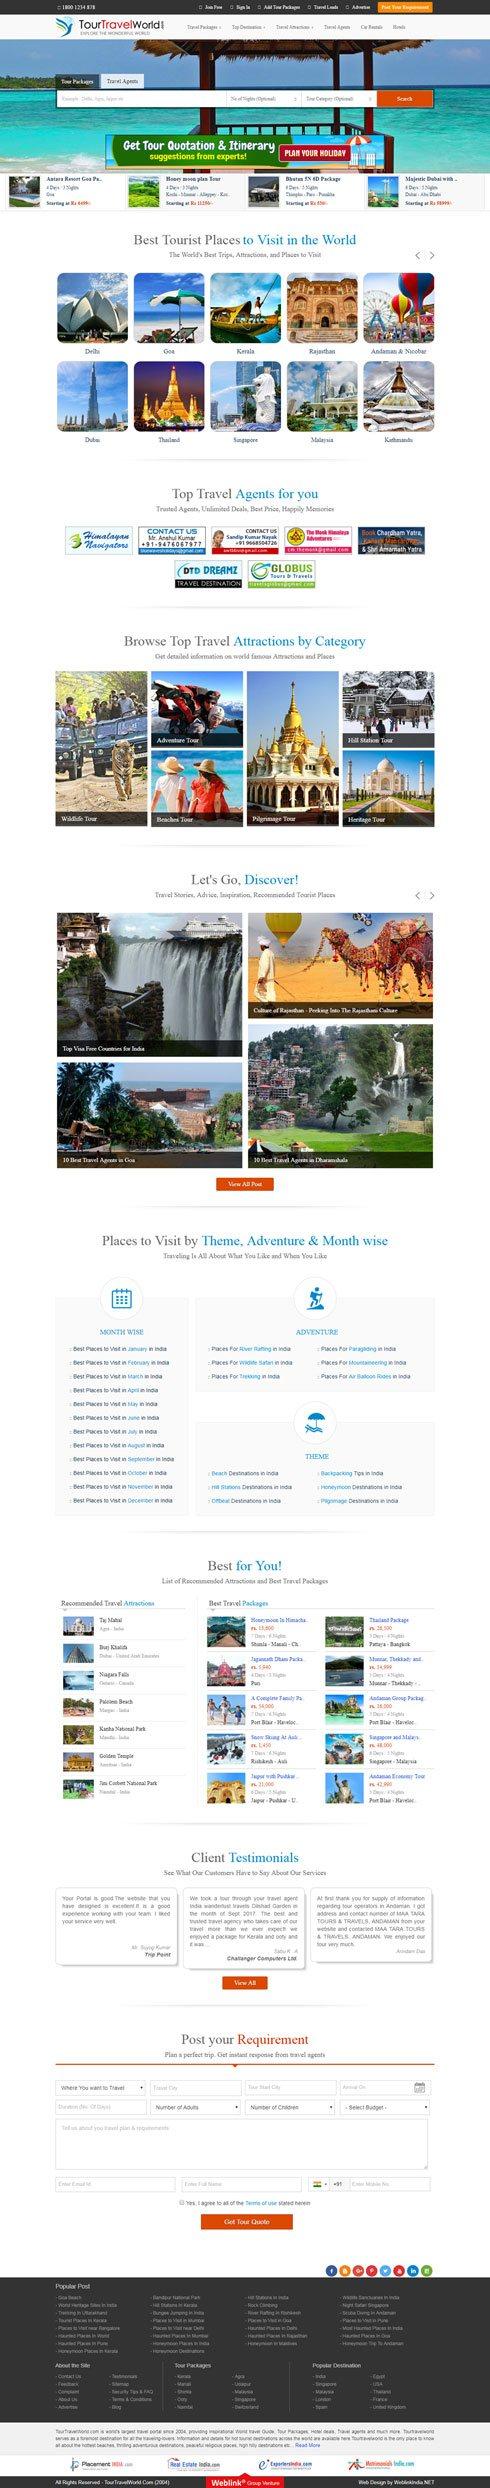 TourTravelWorld India Web Design